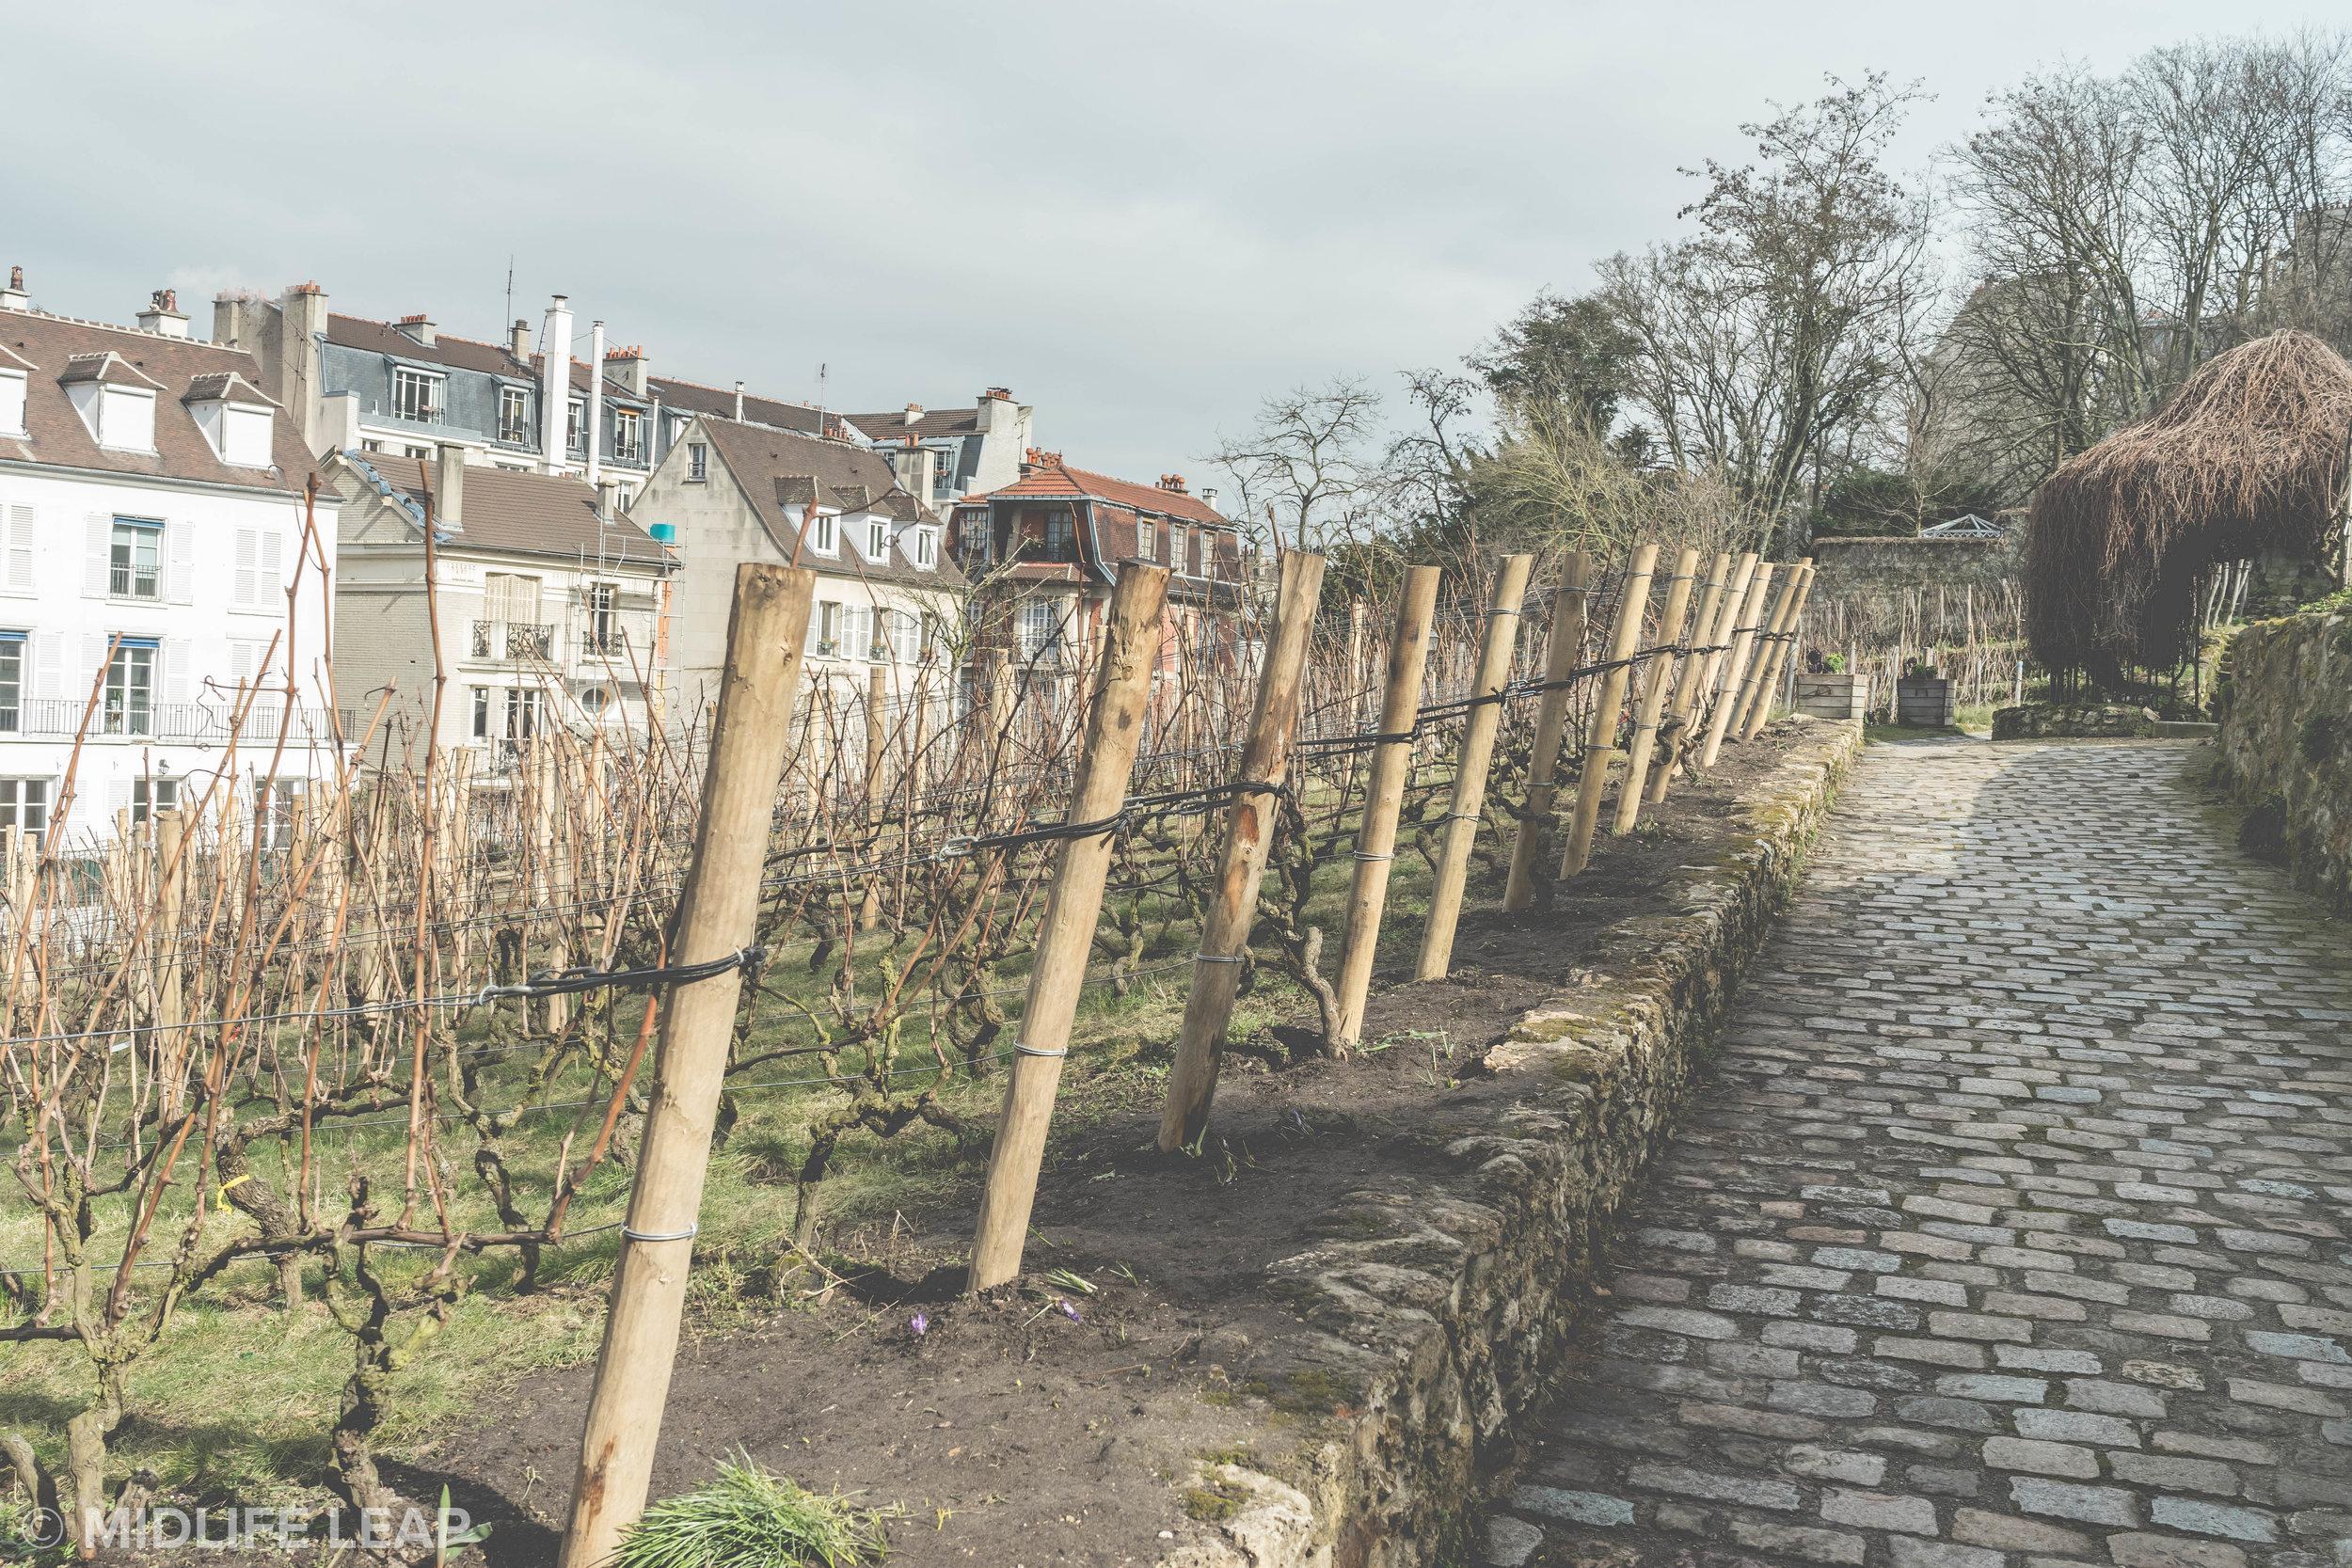 le-clos-montmartre-hidden-vineyards-in-paris